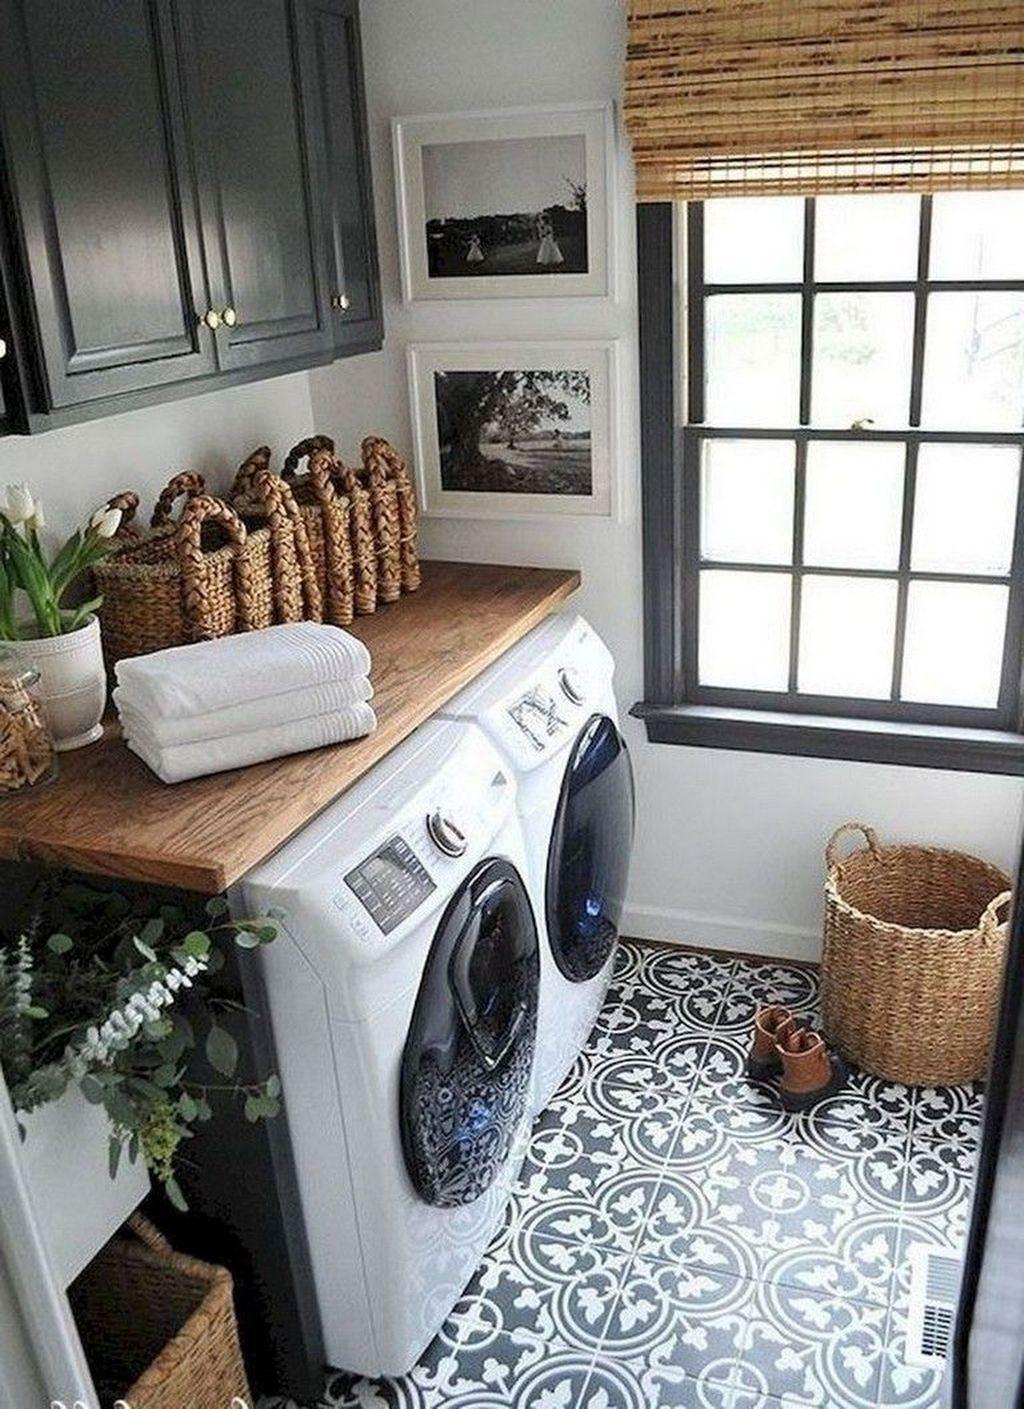 44 Inspiring Small Laundry Room Design Ideas Huis Interieur